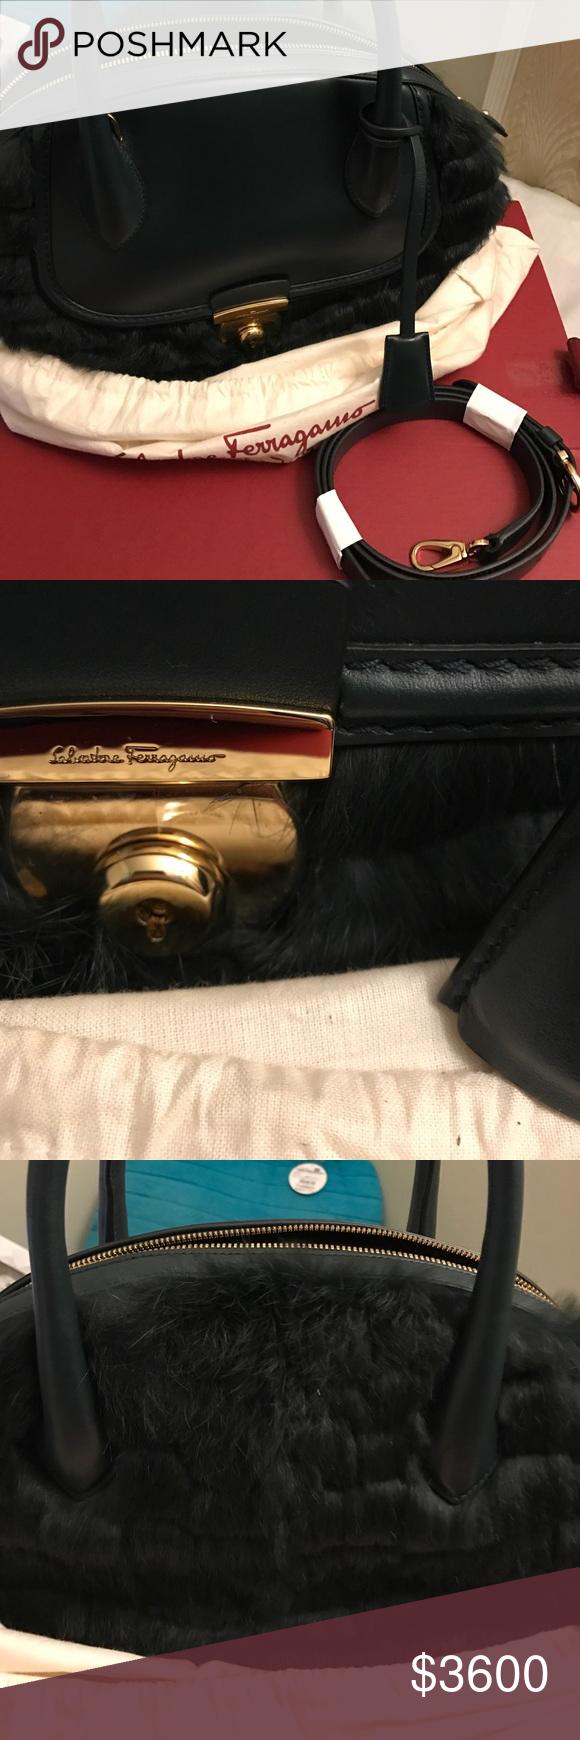 Salvatore Ferragamo Fiamma Bag Brand New Never used. 100% authentic. Comes  with original packaging. Real rabbit fur. Bought it from Ferragamo website. d388d5e68e096